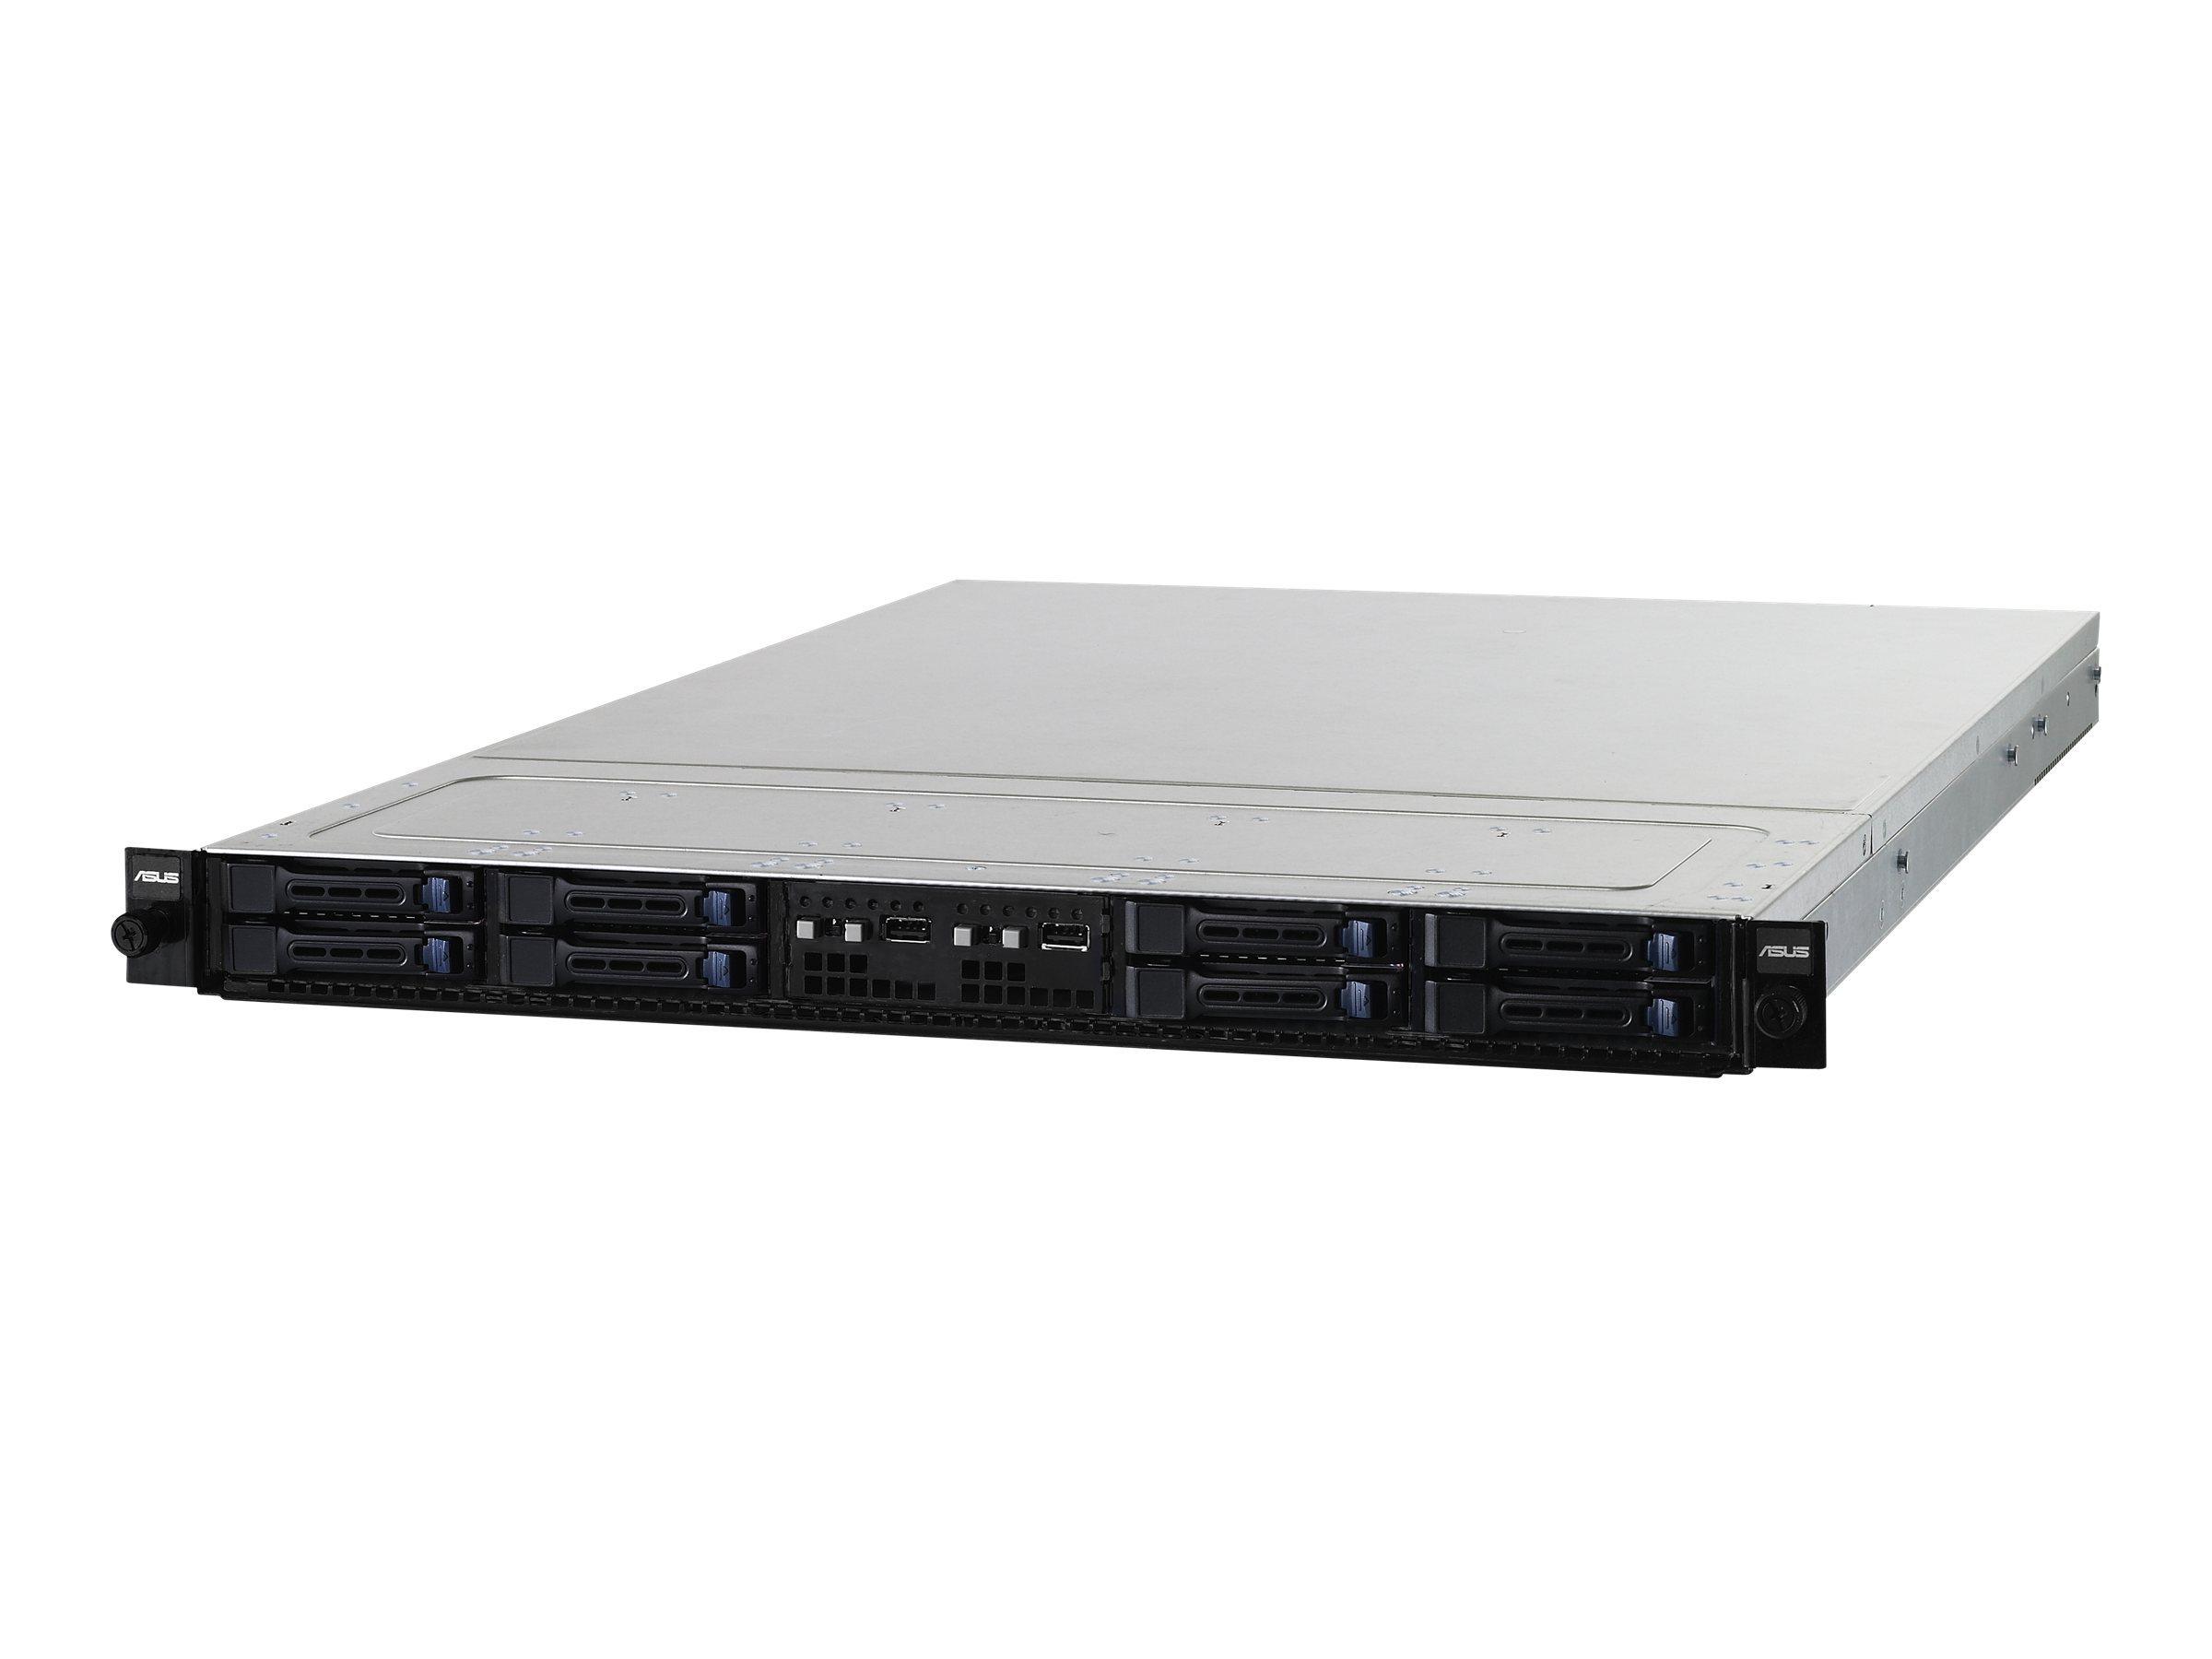 ASUS RS700D-E6/PS8 - 2 Knoten - Cluster - Rack-Montage - 1U - zweiweg